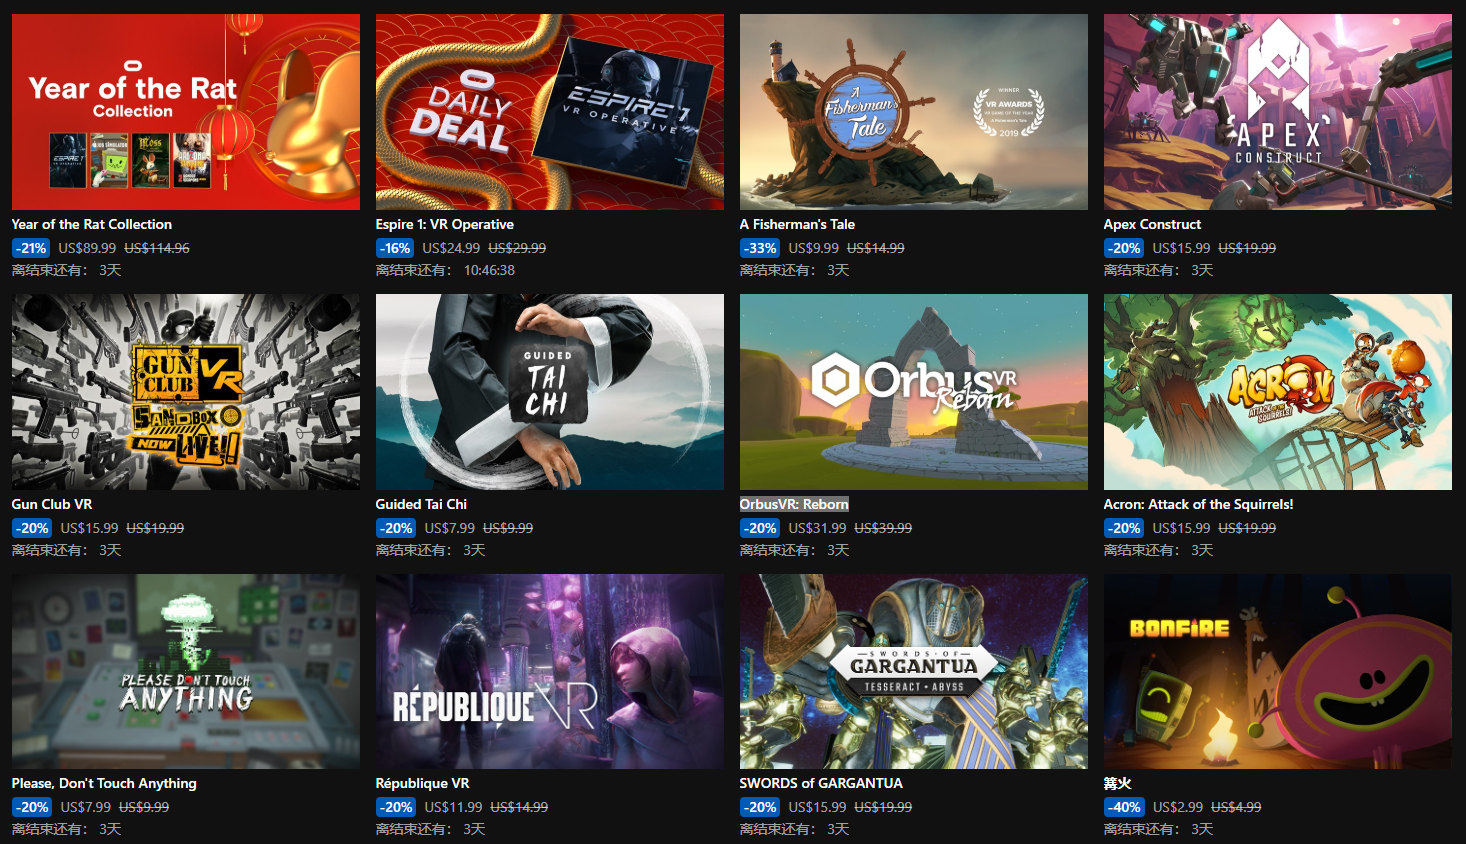 Quest、Rift游戏春节特卖促销,《亚利桑那阳光》降价65%